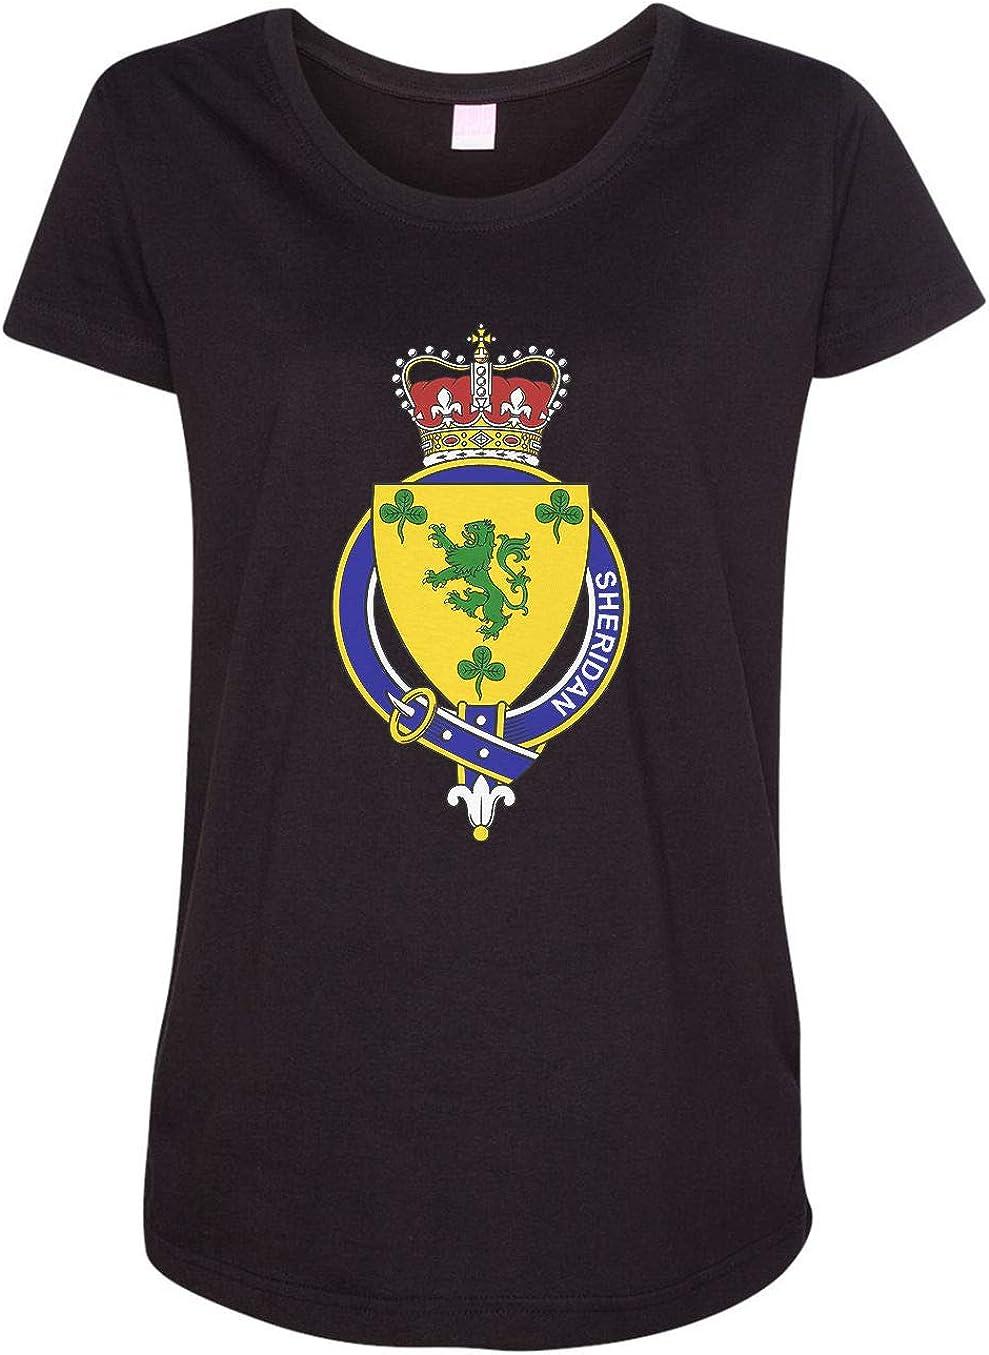 HARD EDGE DESIGN Women's Irish Garter Family Sheridan T-Shirt